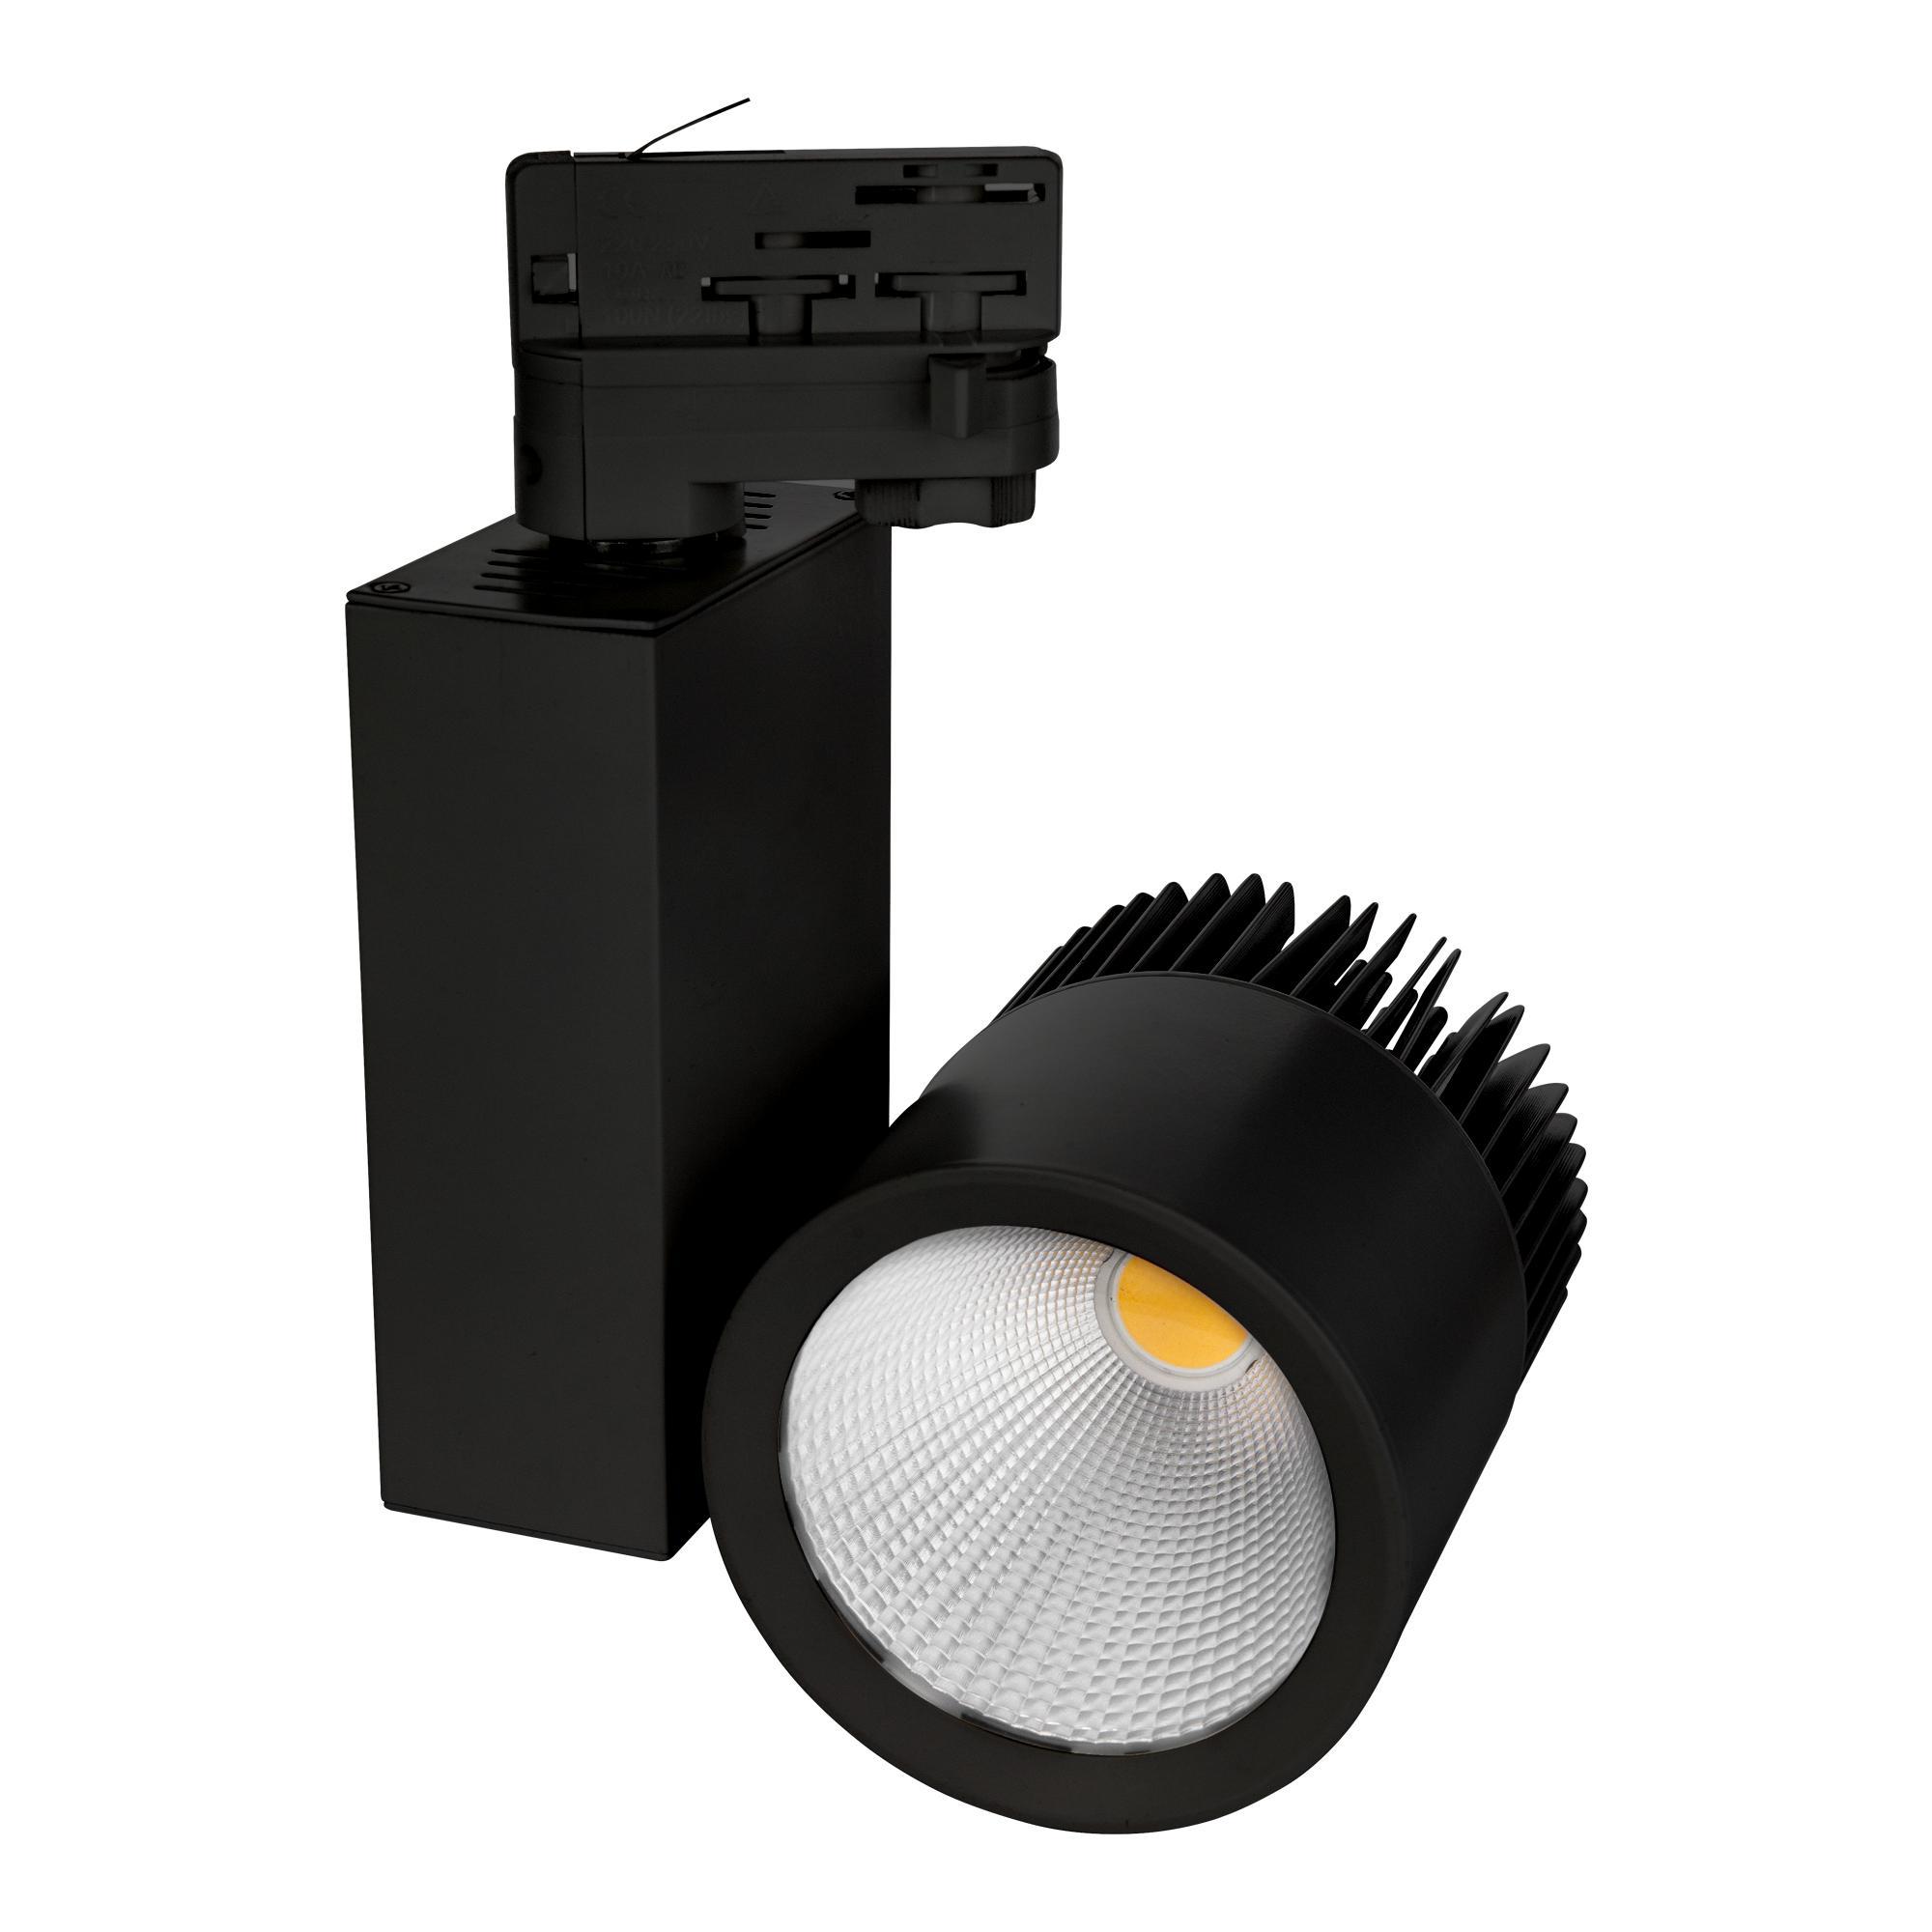 MDR APUS 940 35W 230V 15ST BLACK DIM